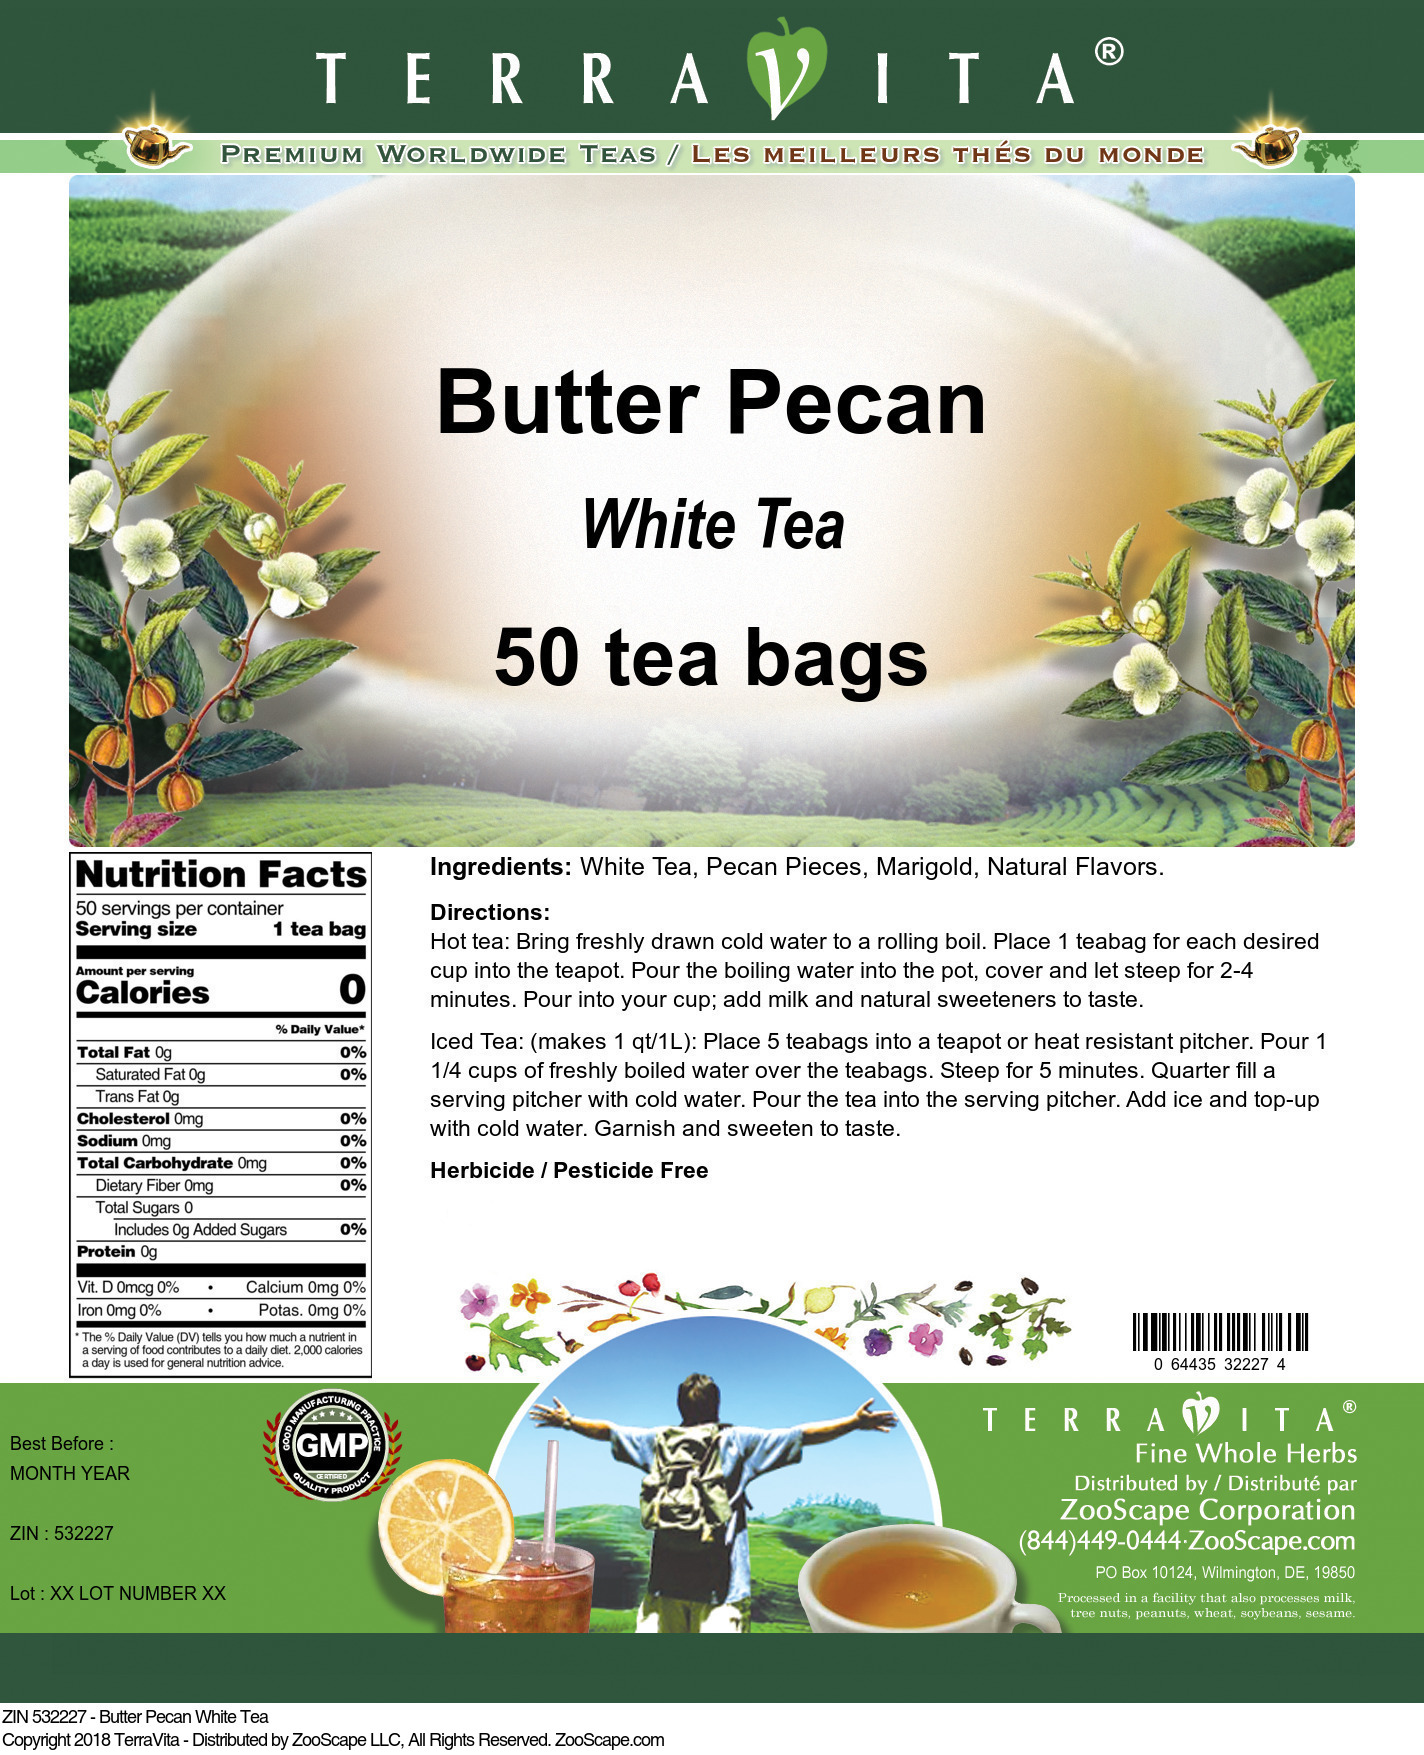 Butter Pecan White Tea